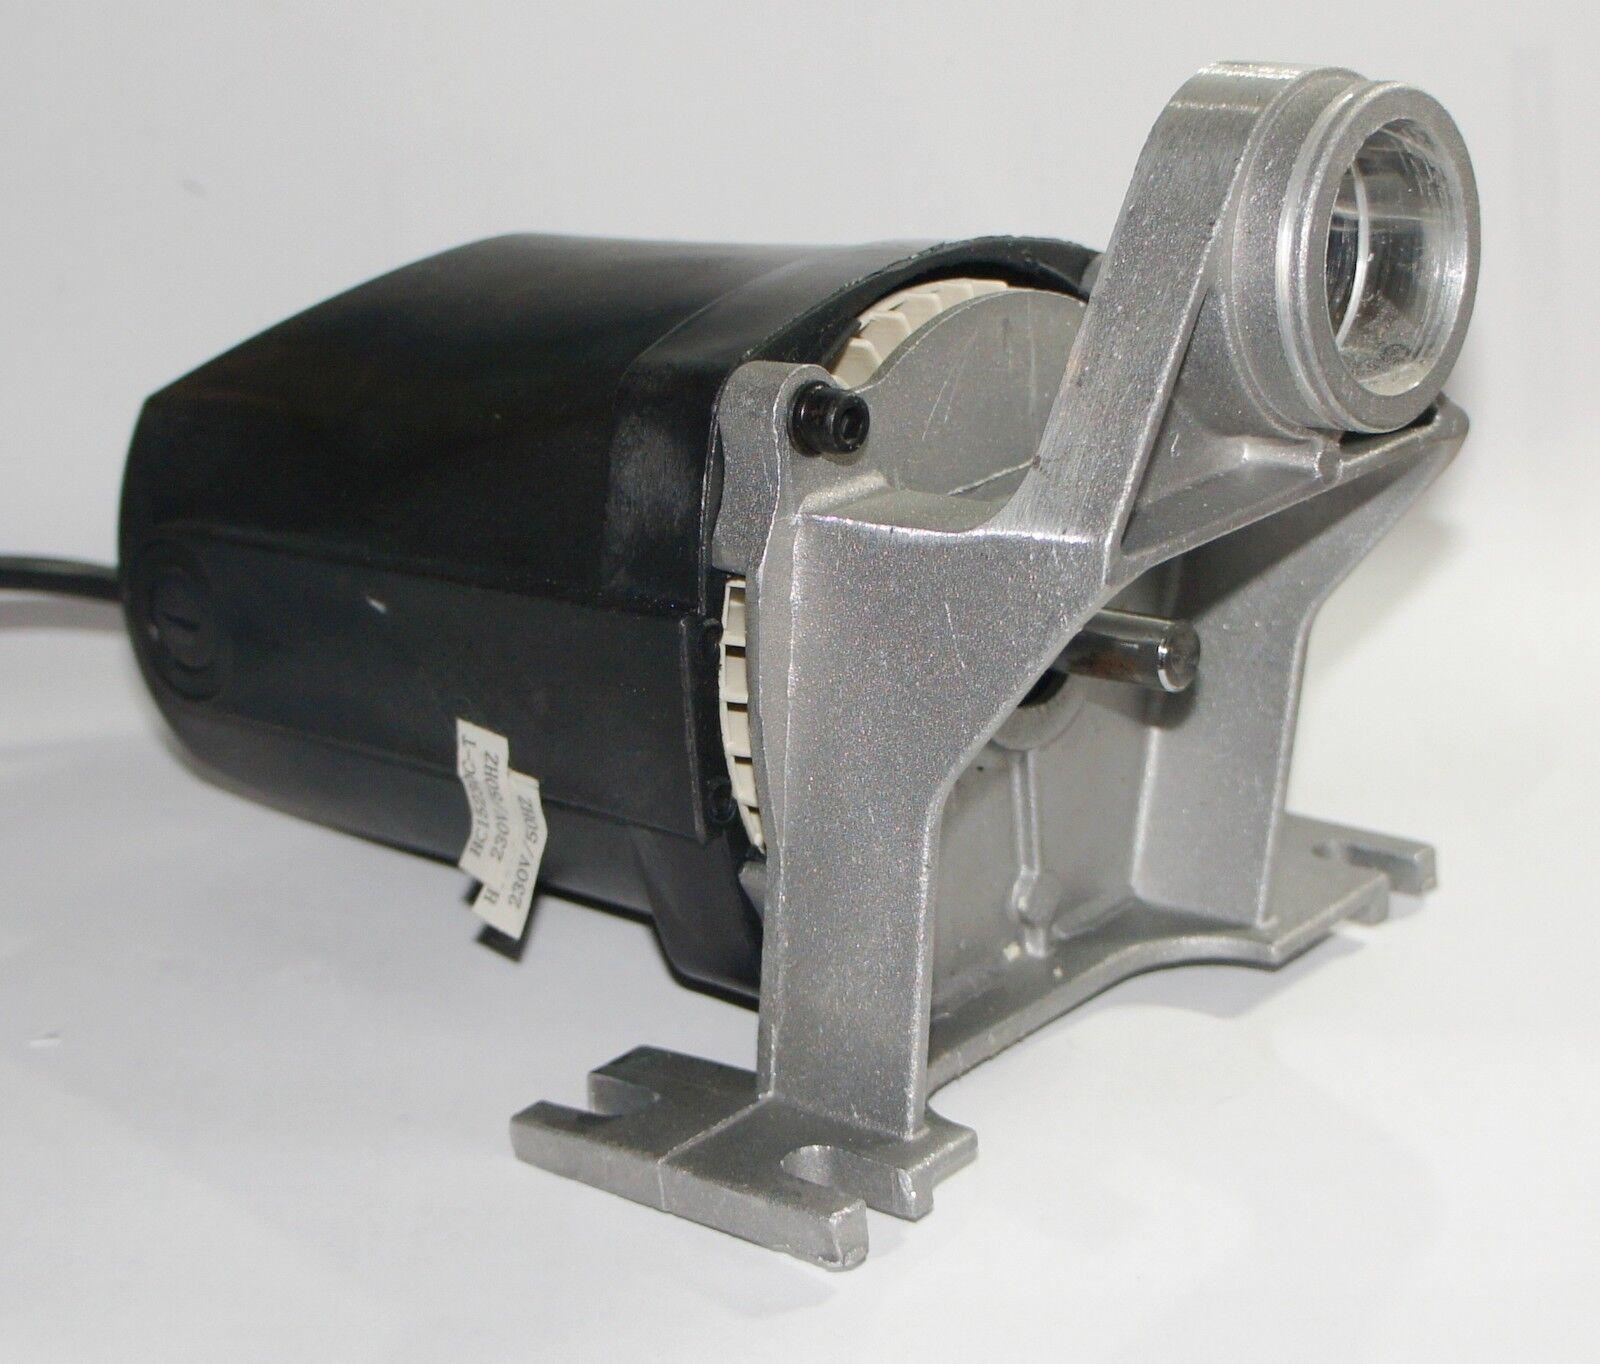 Motor EINHELL TKS 1500 ECO - Alpha Tools  TK 1500 E - Tischkreissäge Kreissäge